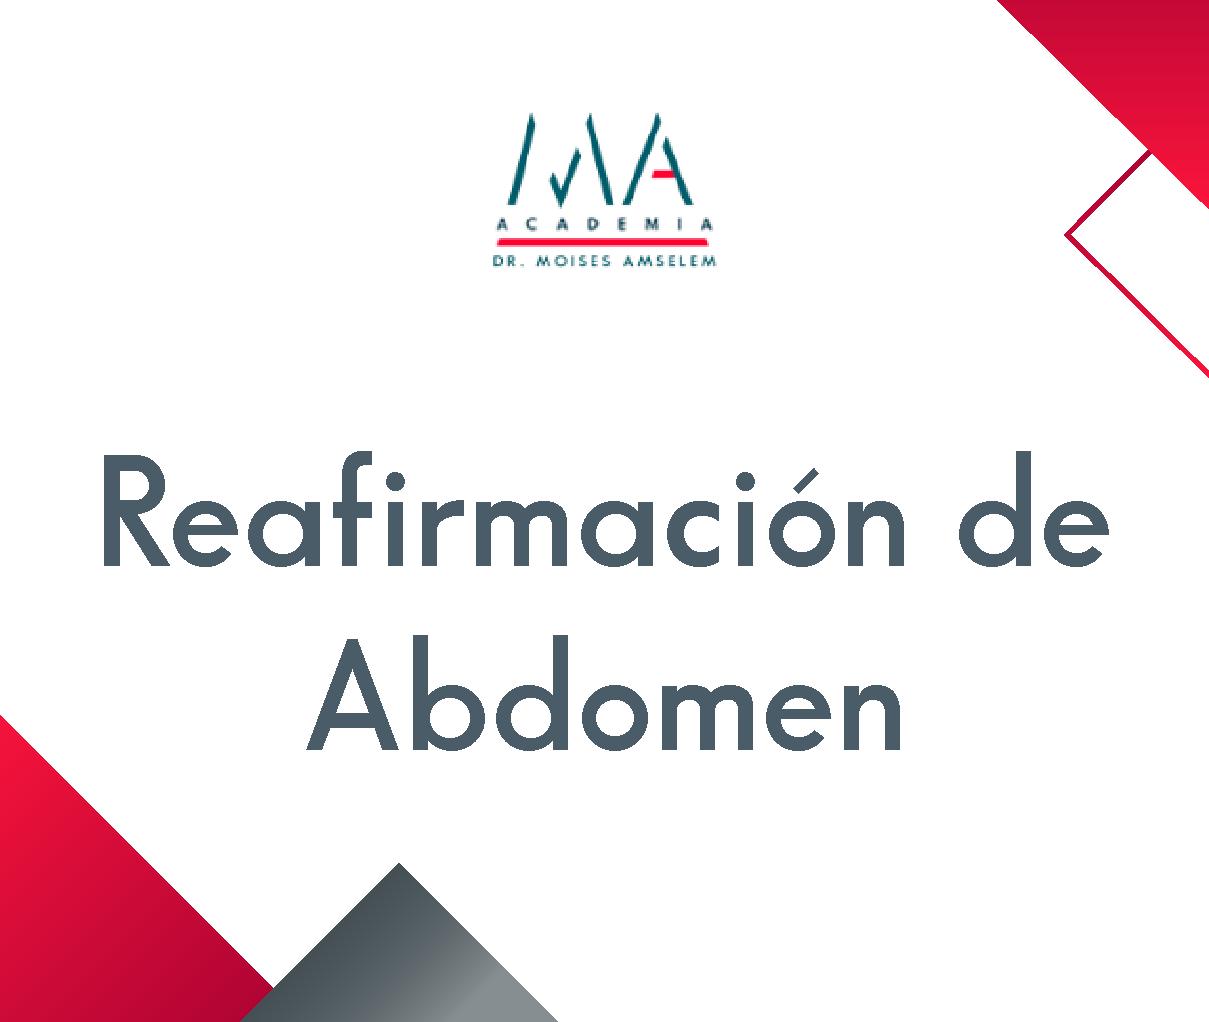 Reafirmación de abdomen